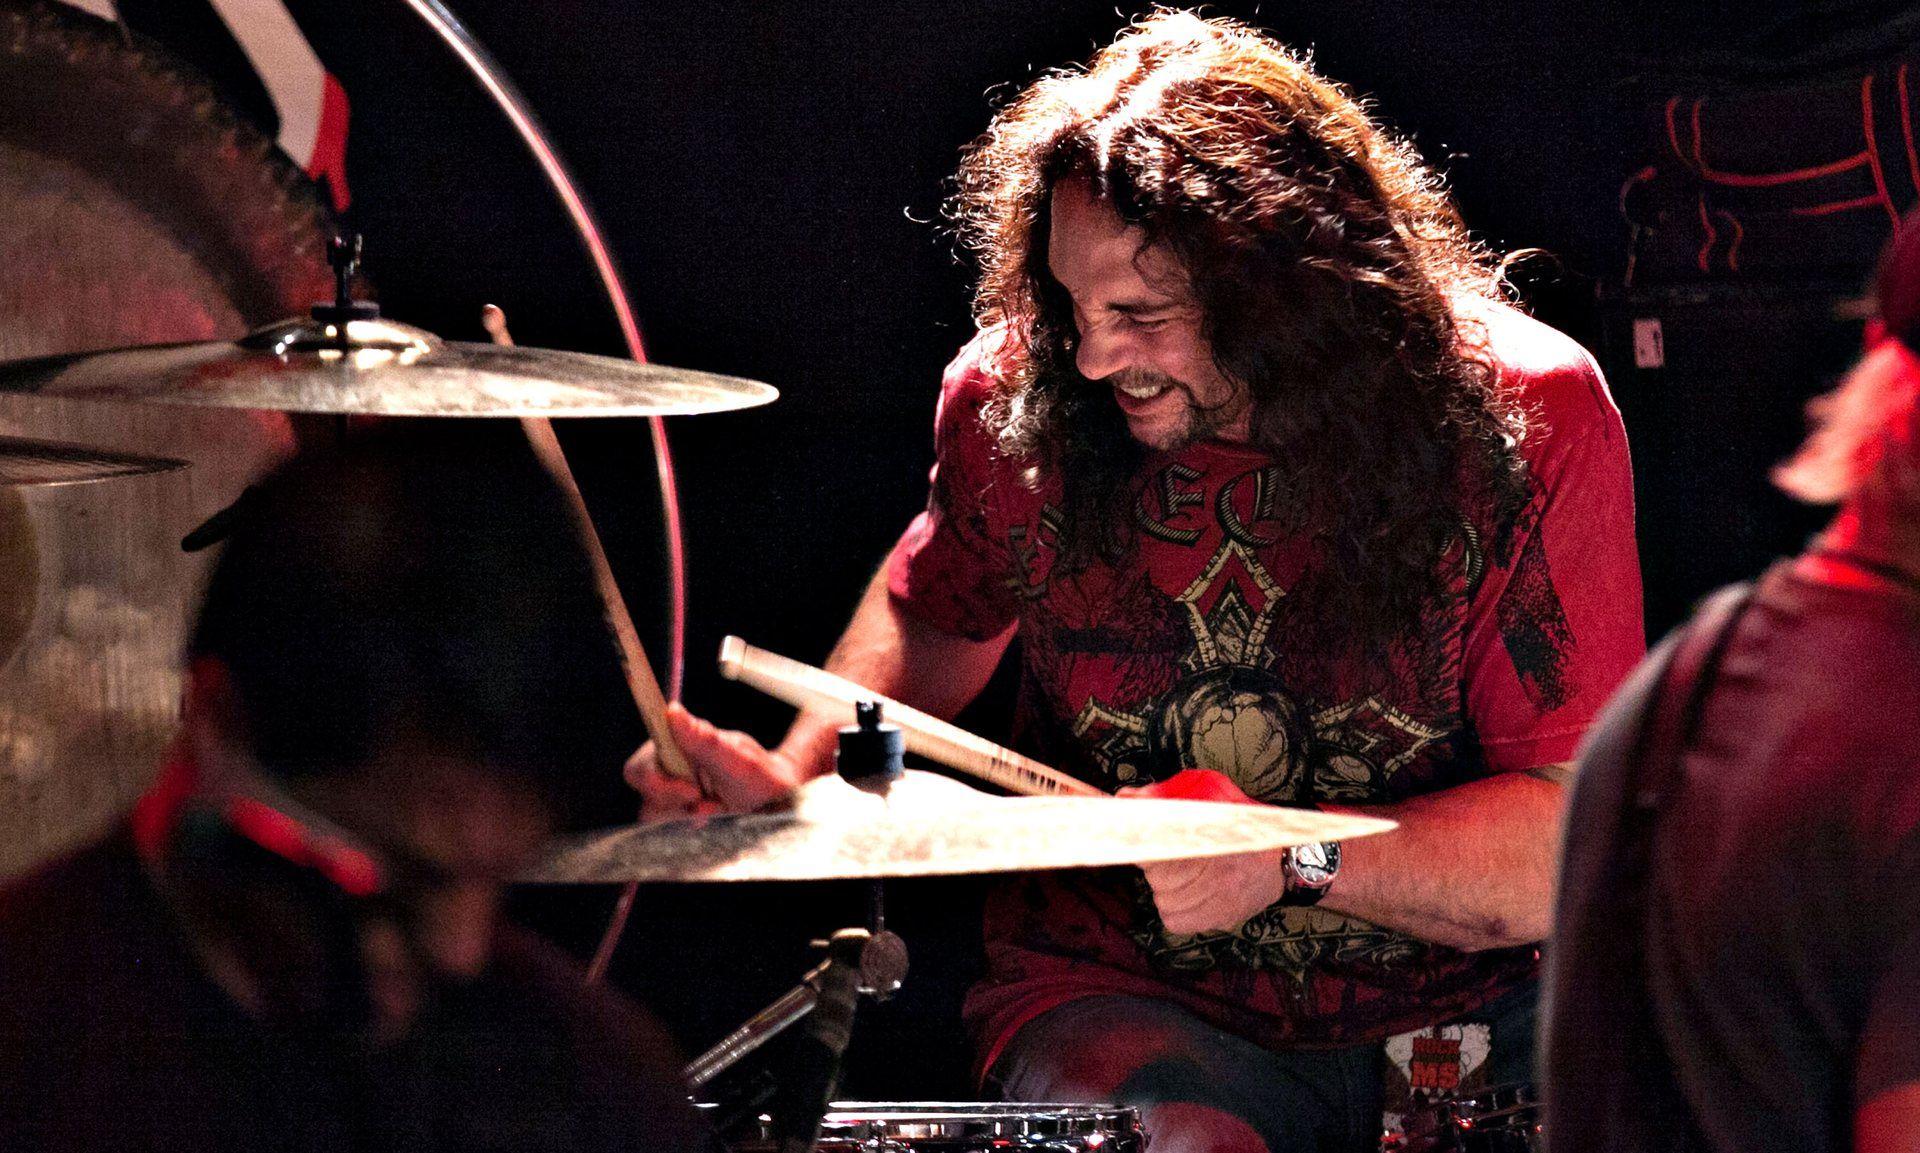 El rock de luto: el ex baterista de Megadeth murió en pleno show